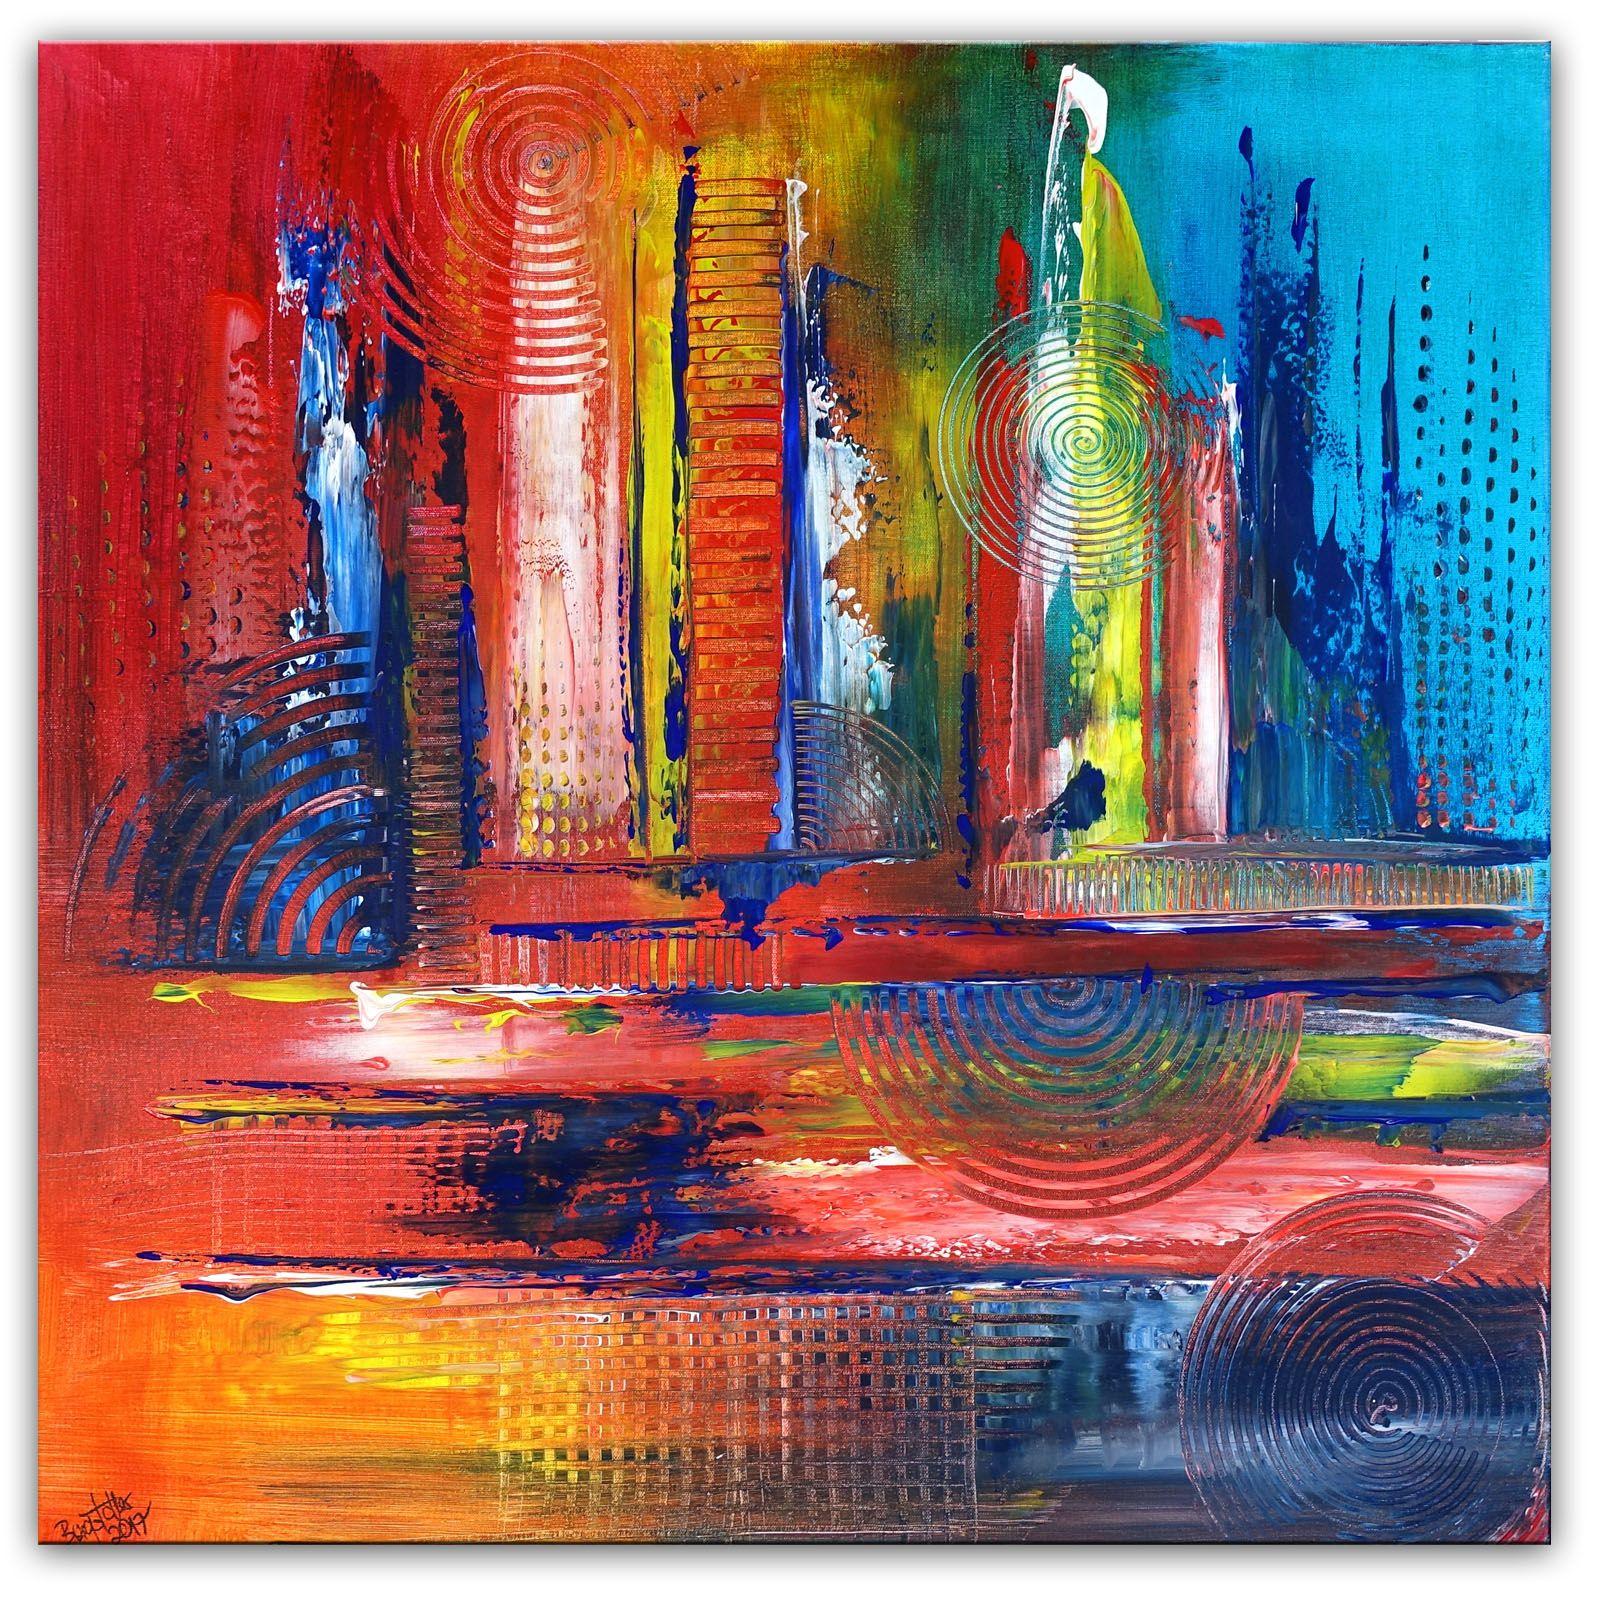 fluid art abstrakte kunst malerei grun rot gemalde abstrakt acrylbilder leinwand gemälde bekannte künstler